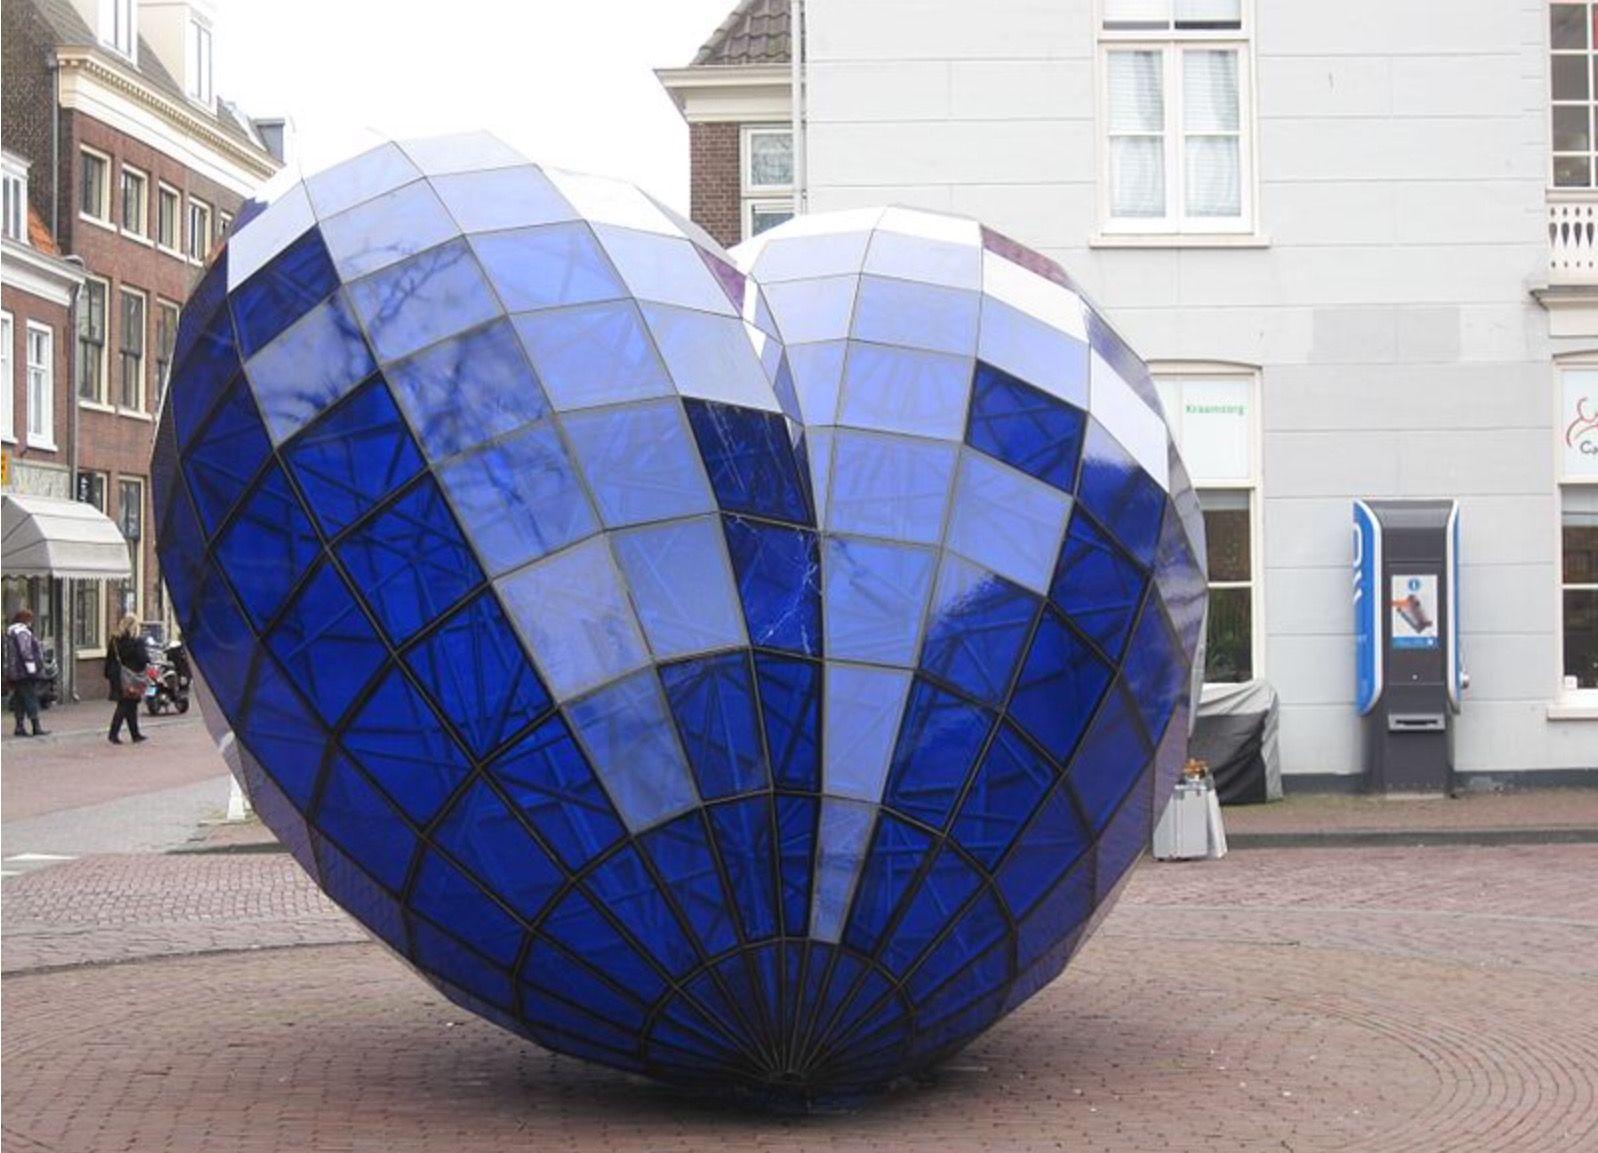 Badezimmerdesign bangladesch coeur bleu au centre de la ville u  blau azul blue royalblue